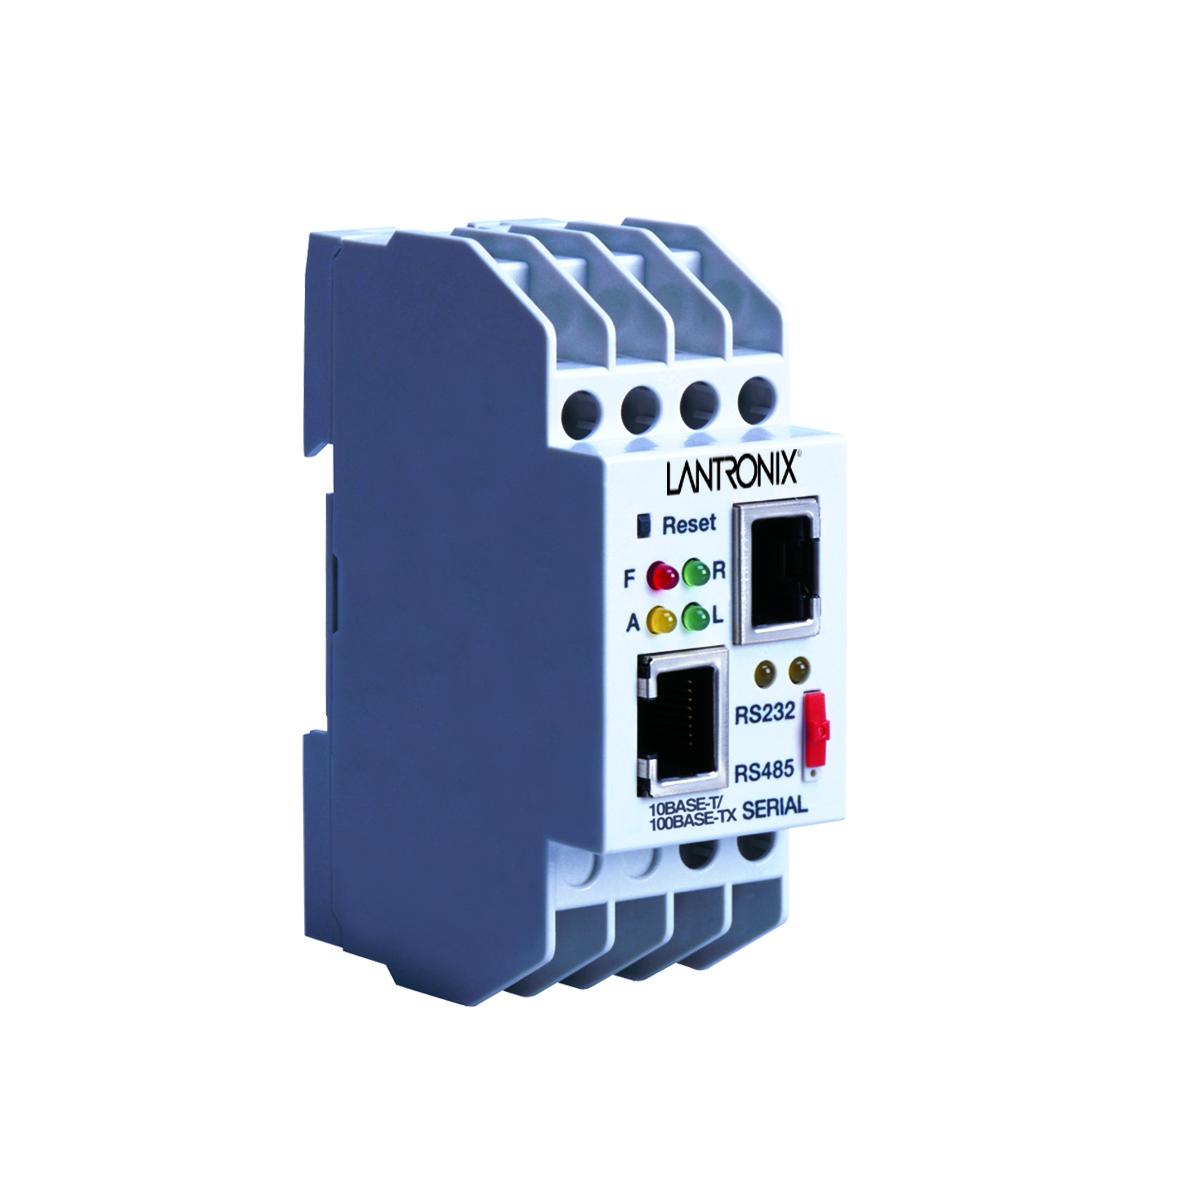 modbus rs485 wiring diagram for 13 pin caravan socket xpress dr iap lantronix industrial device server